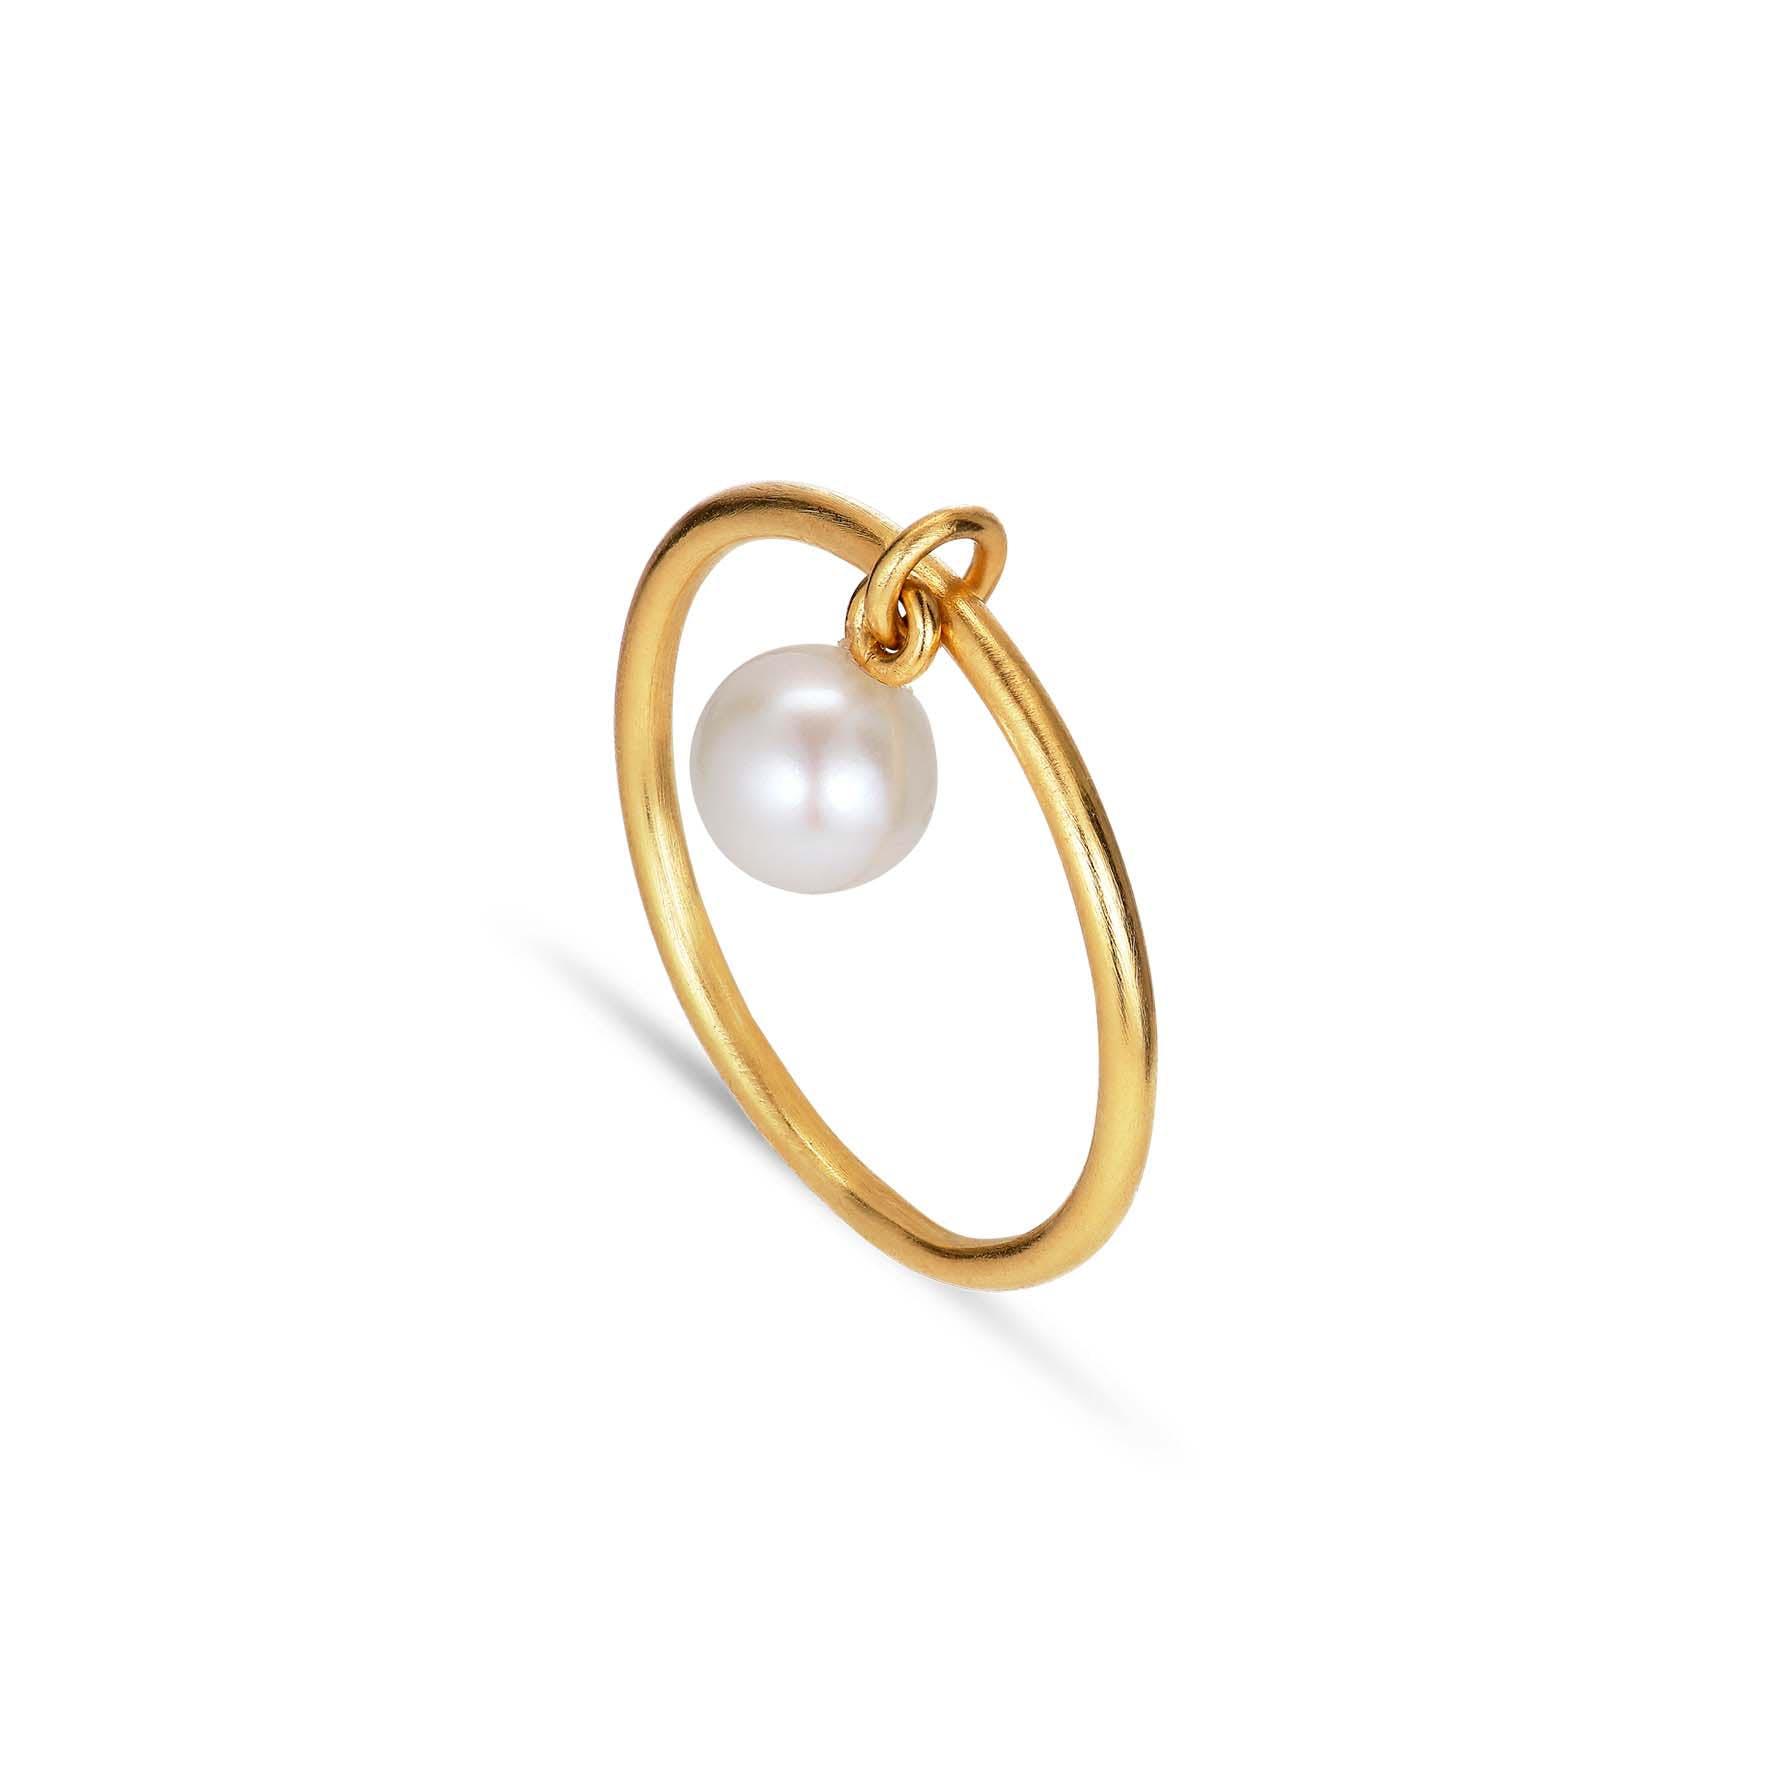 Row Pearl Ring von Jane Kønig in Vergoldet-Silber Sterling 925